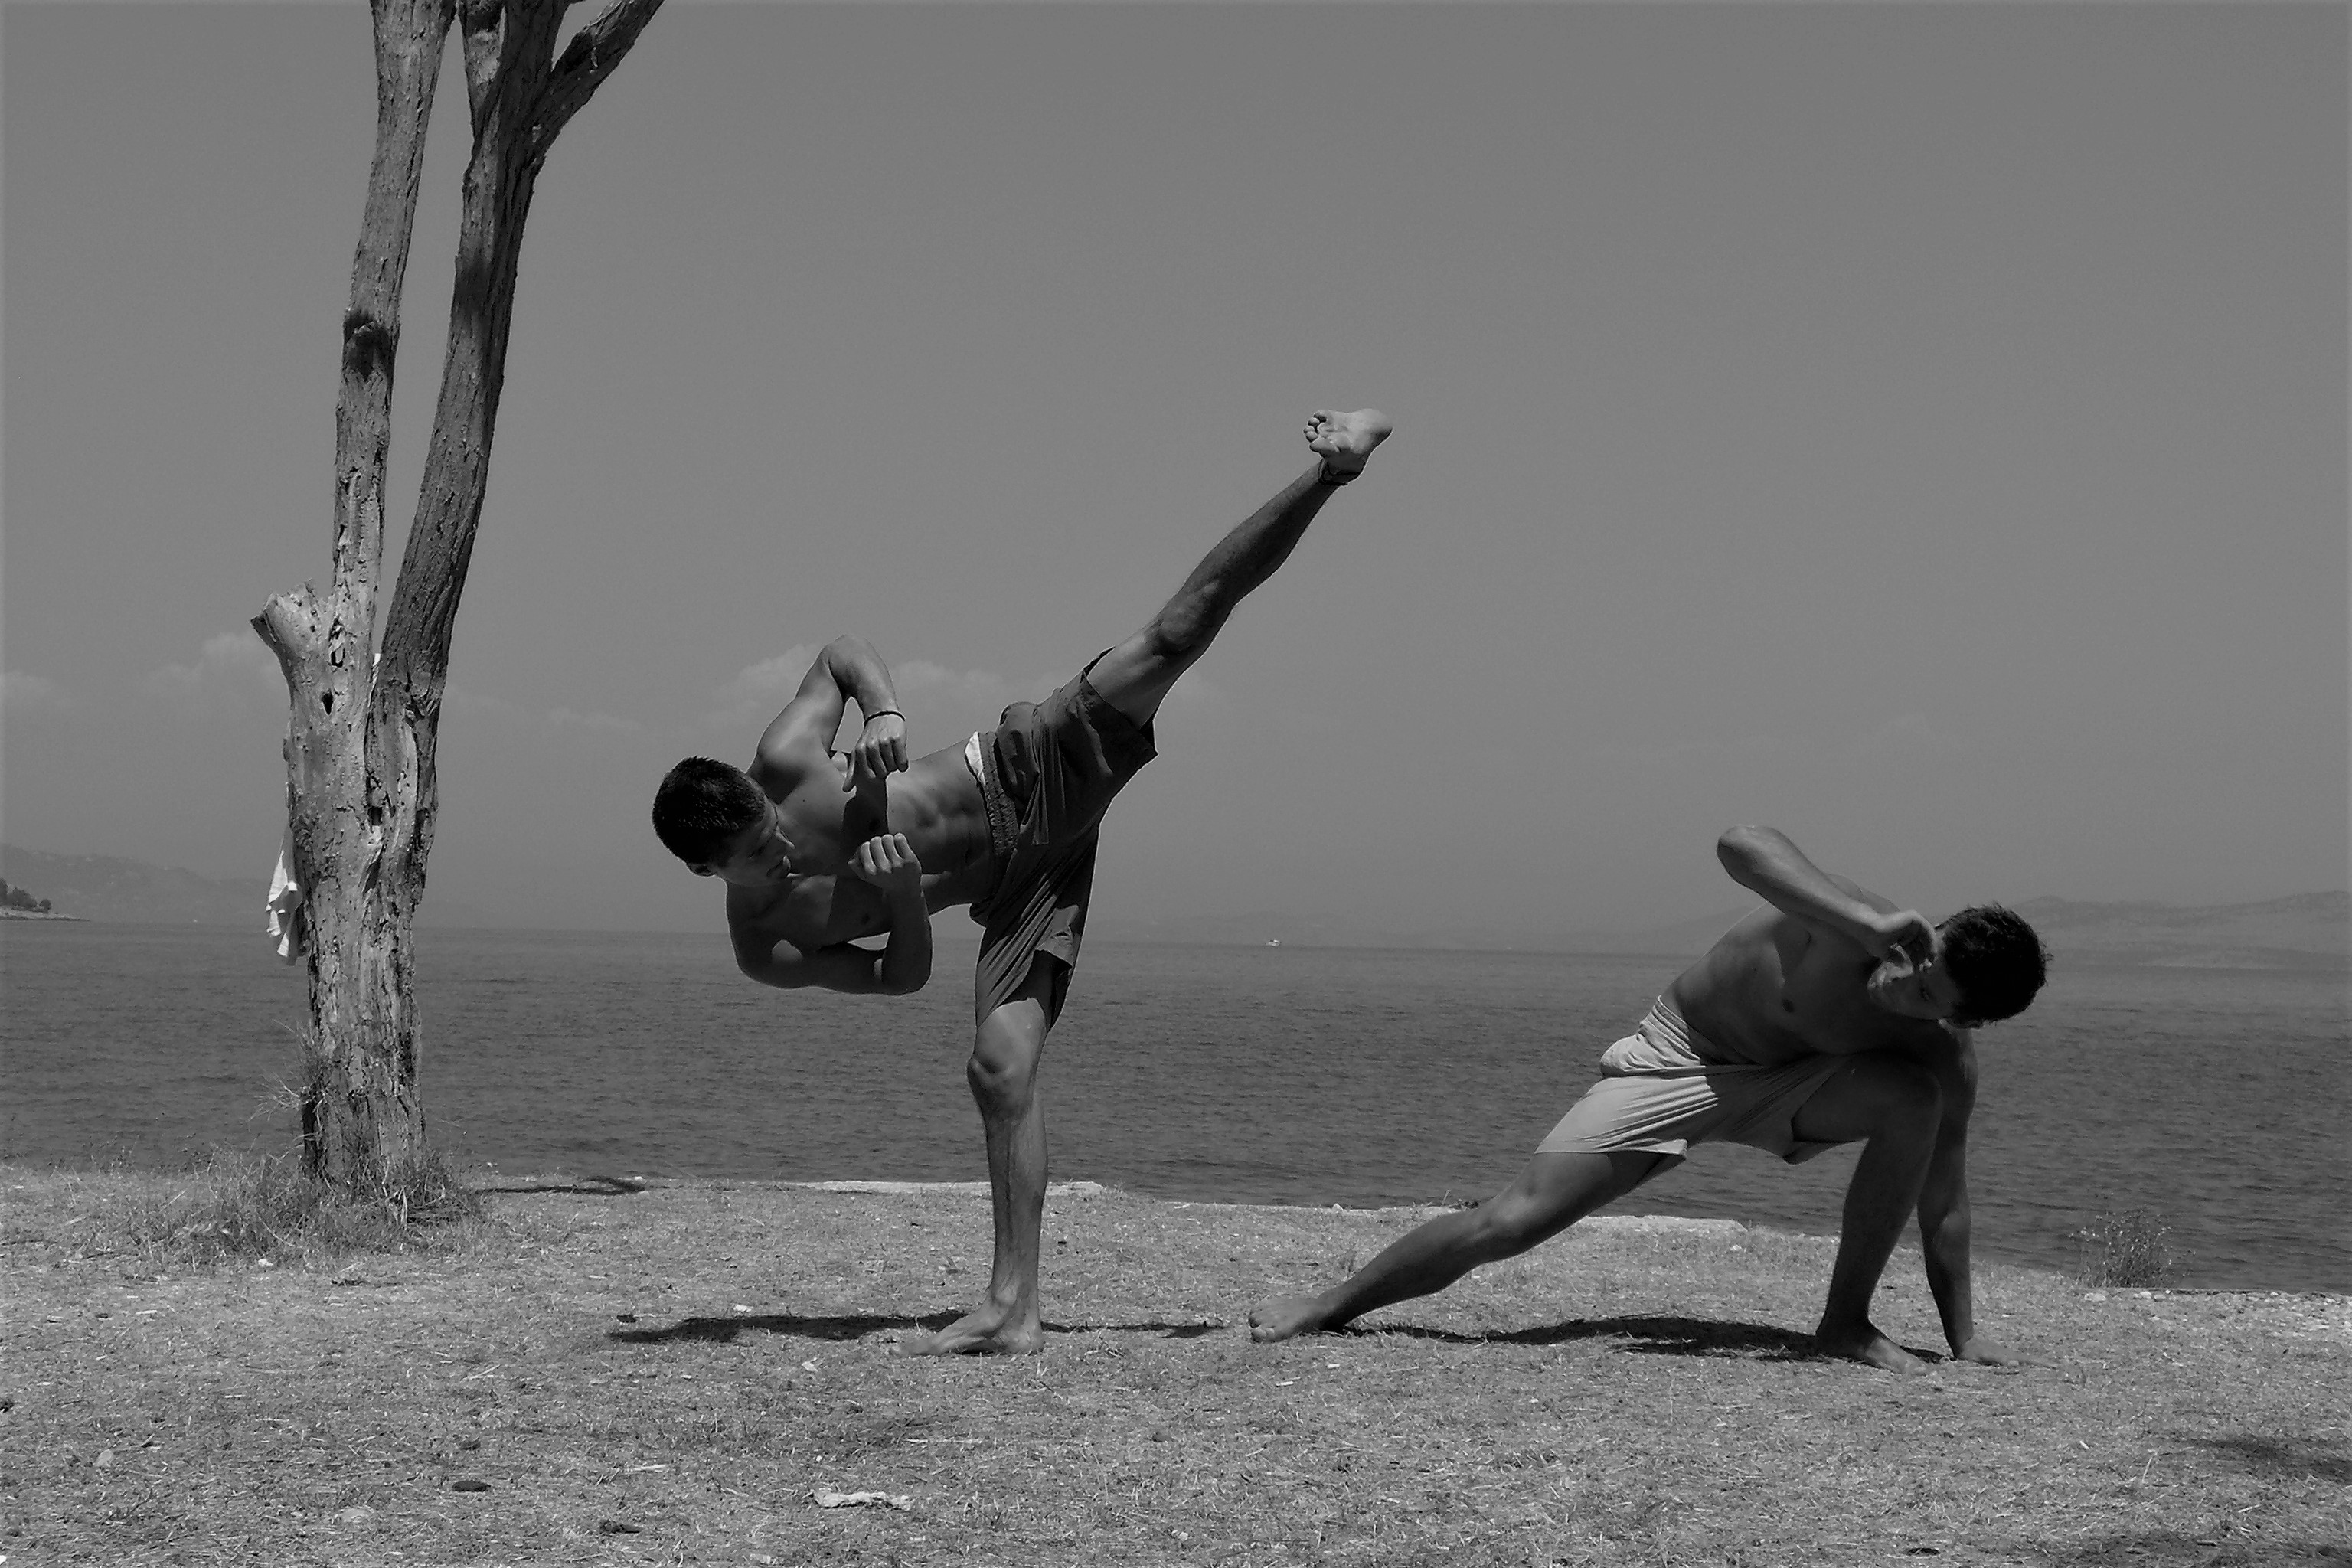 capoeira demonstration